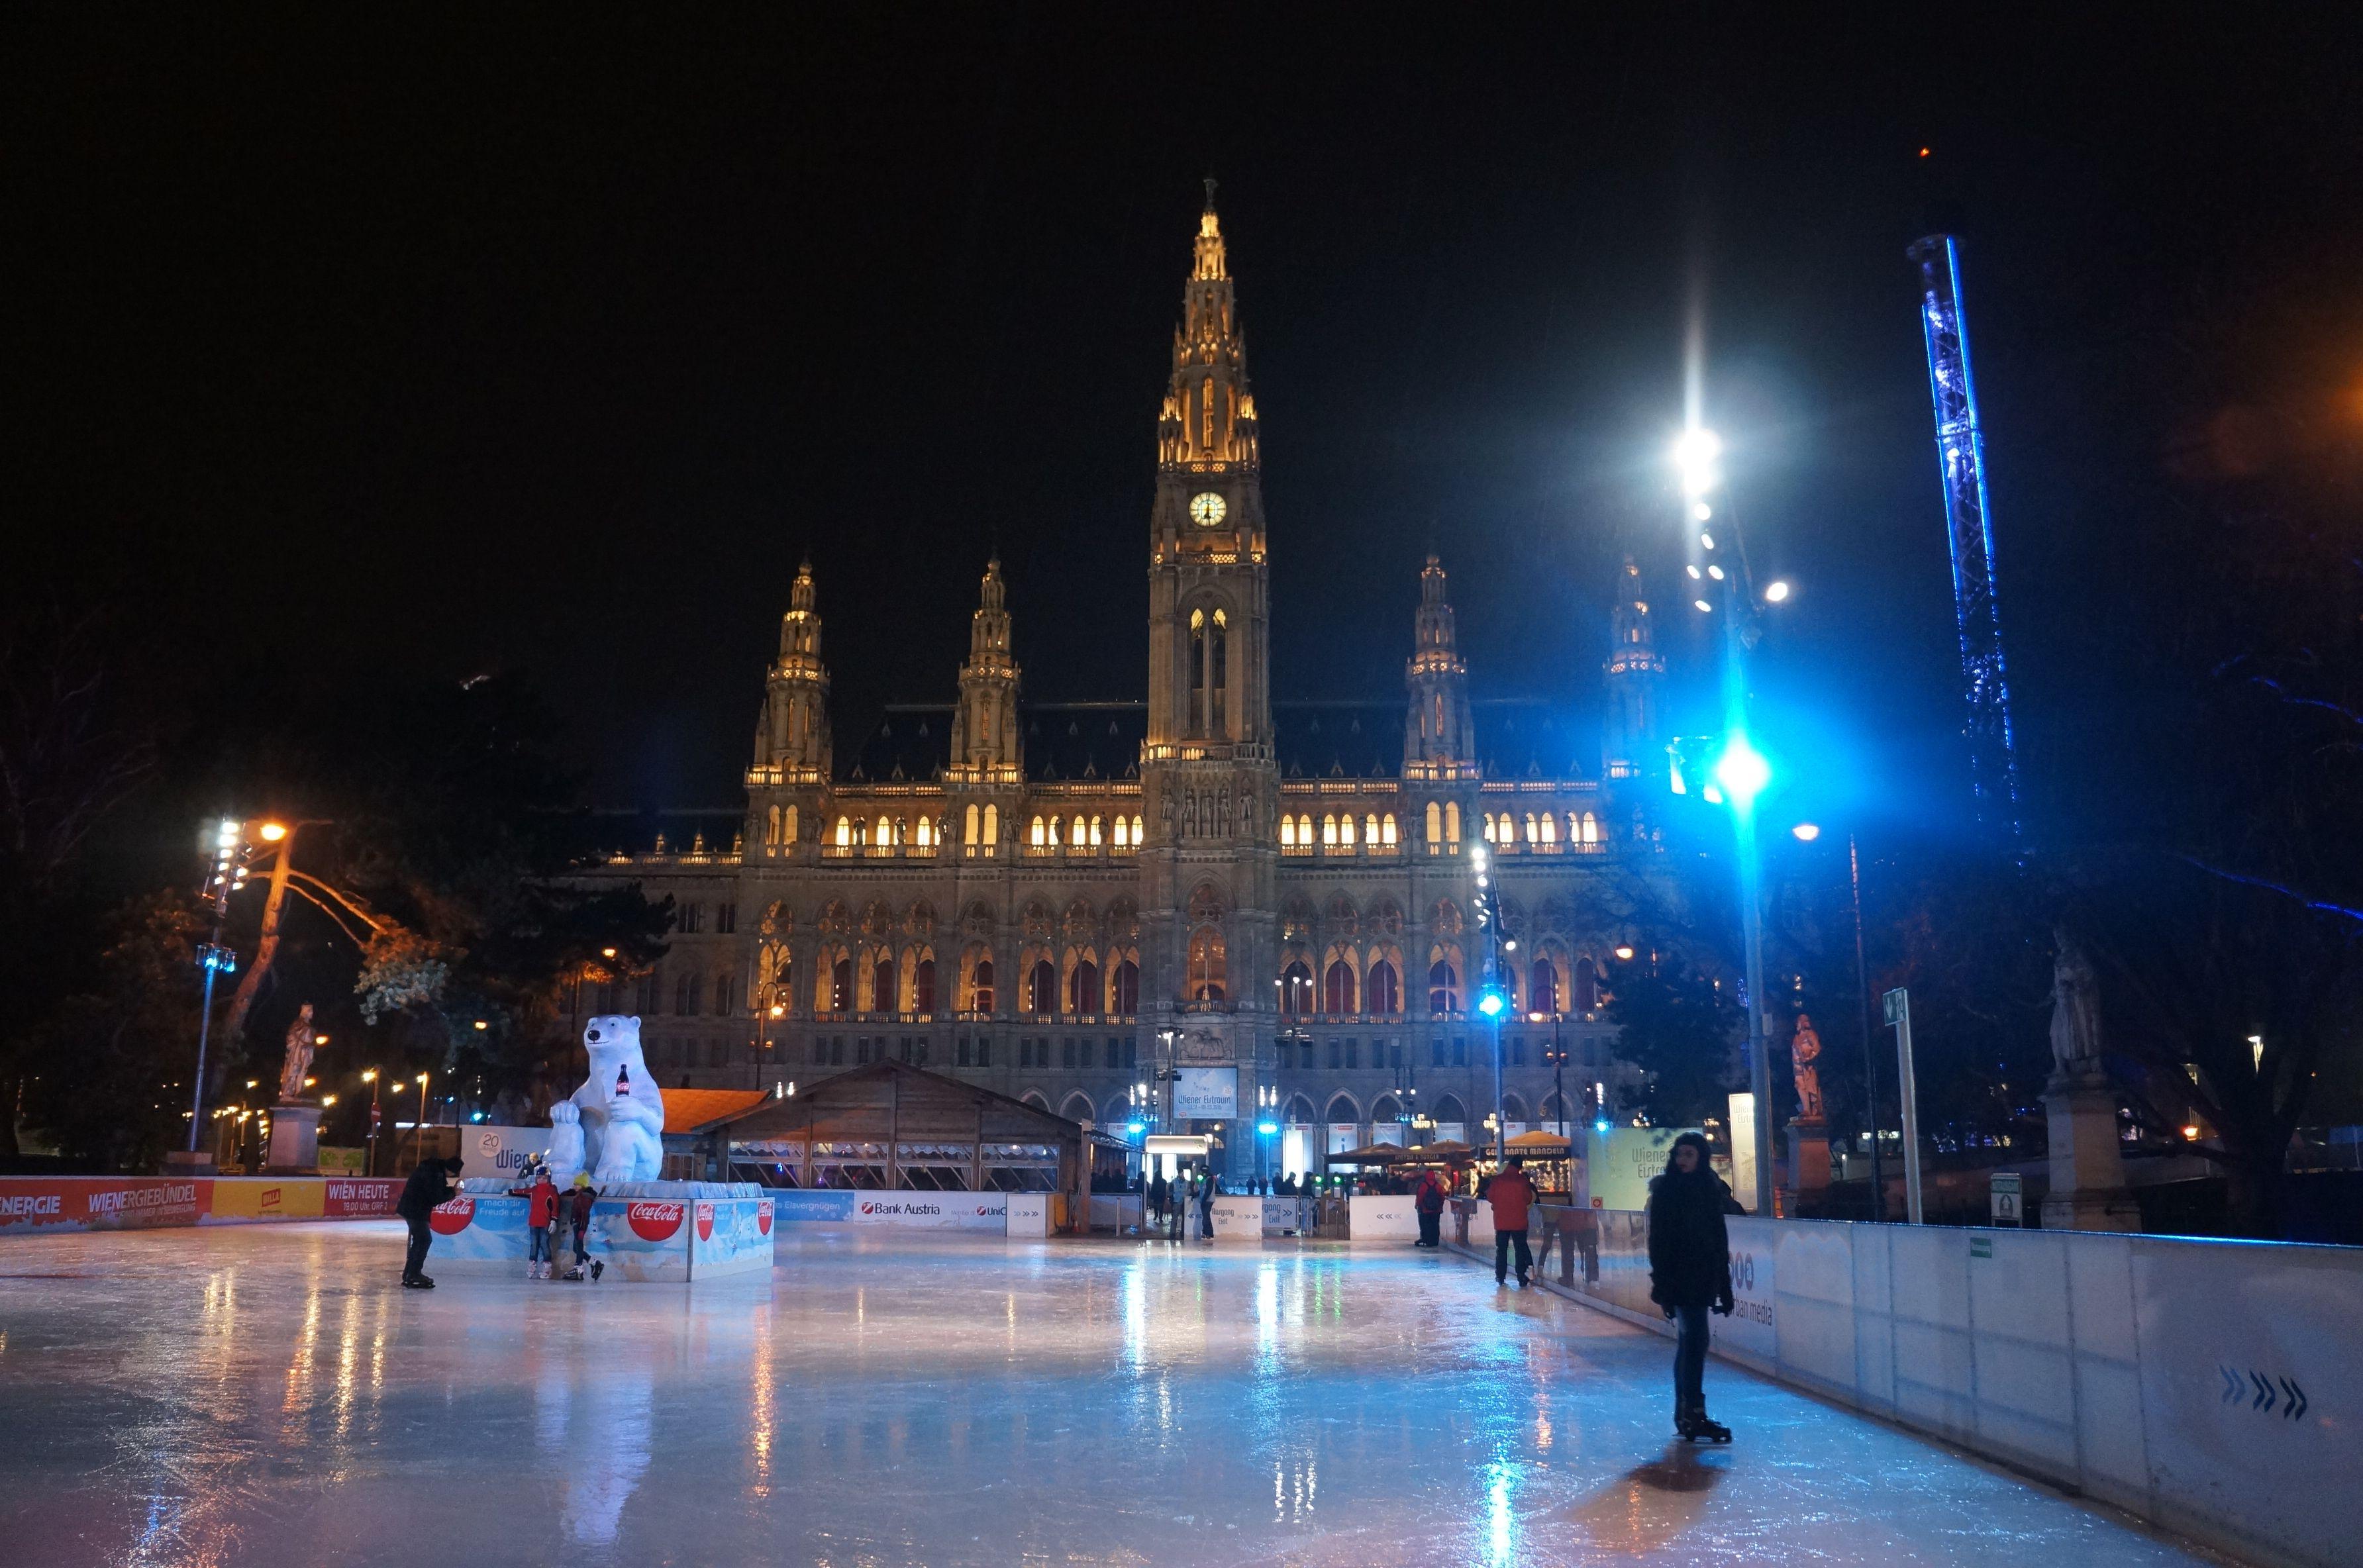 patinoire Rathaus